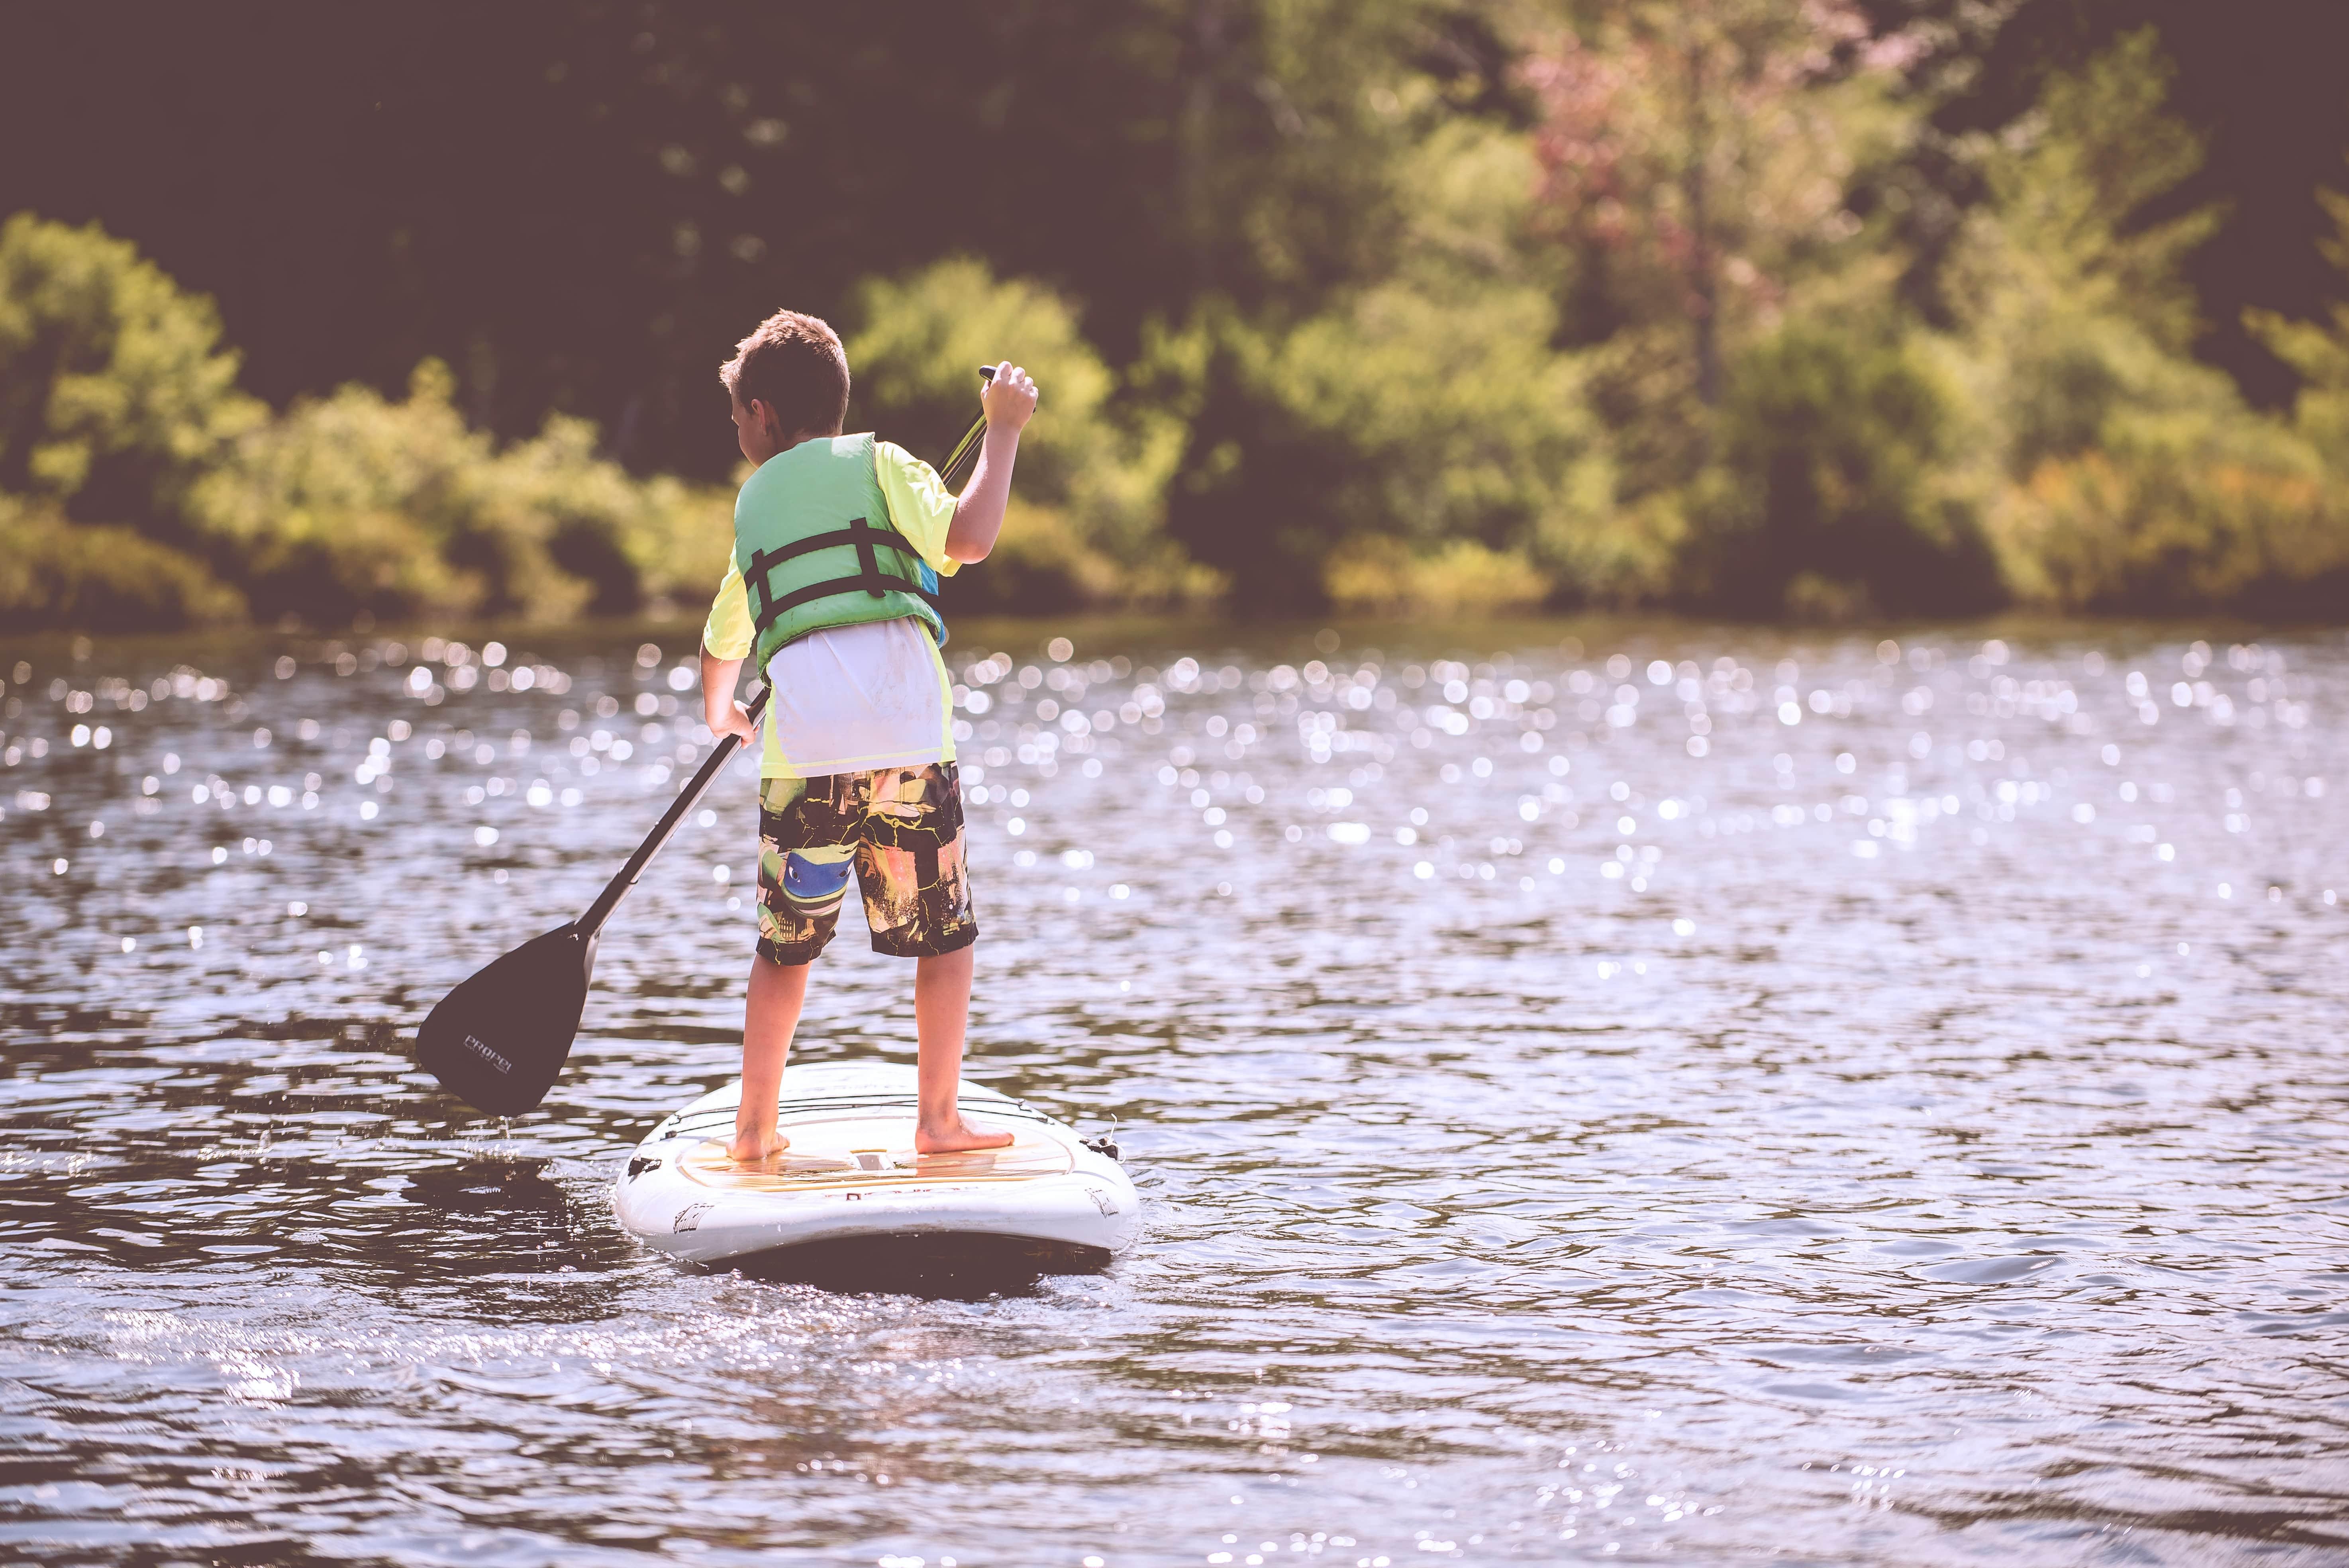 Har du en god outdoor-idé? (Arkivfoto: Ben White)